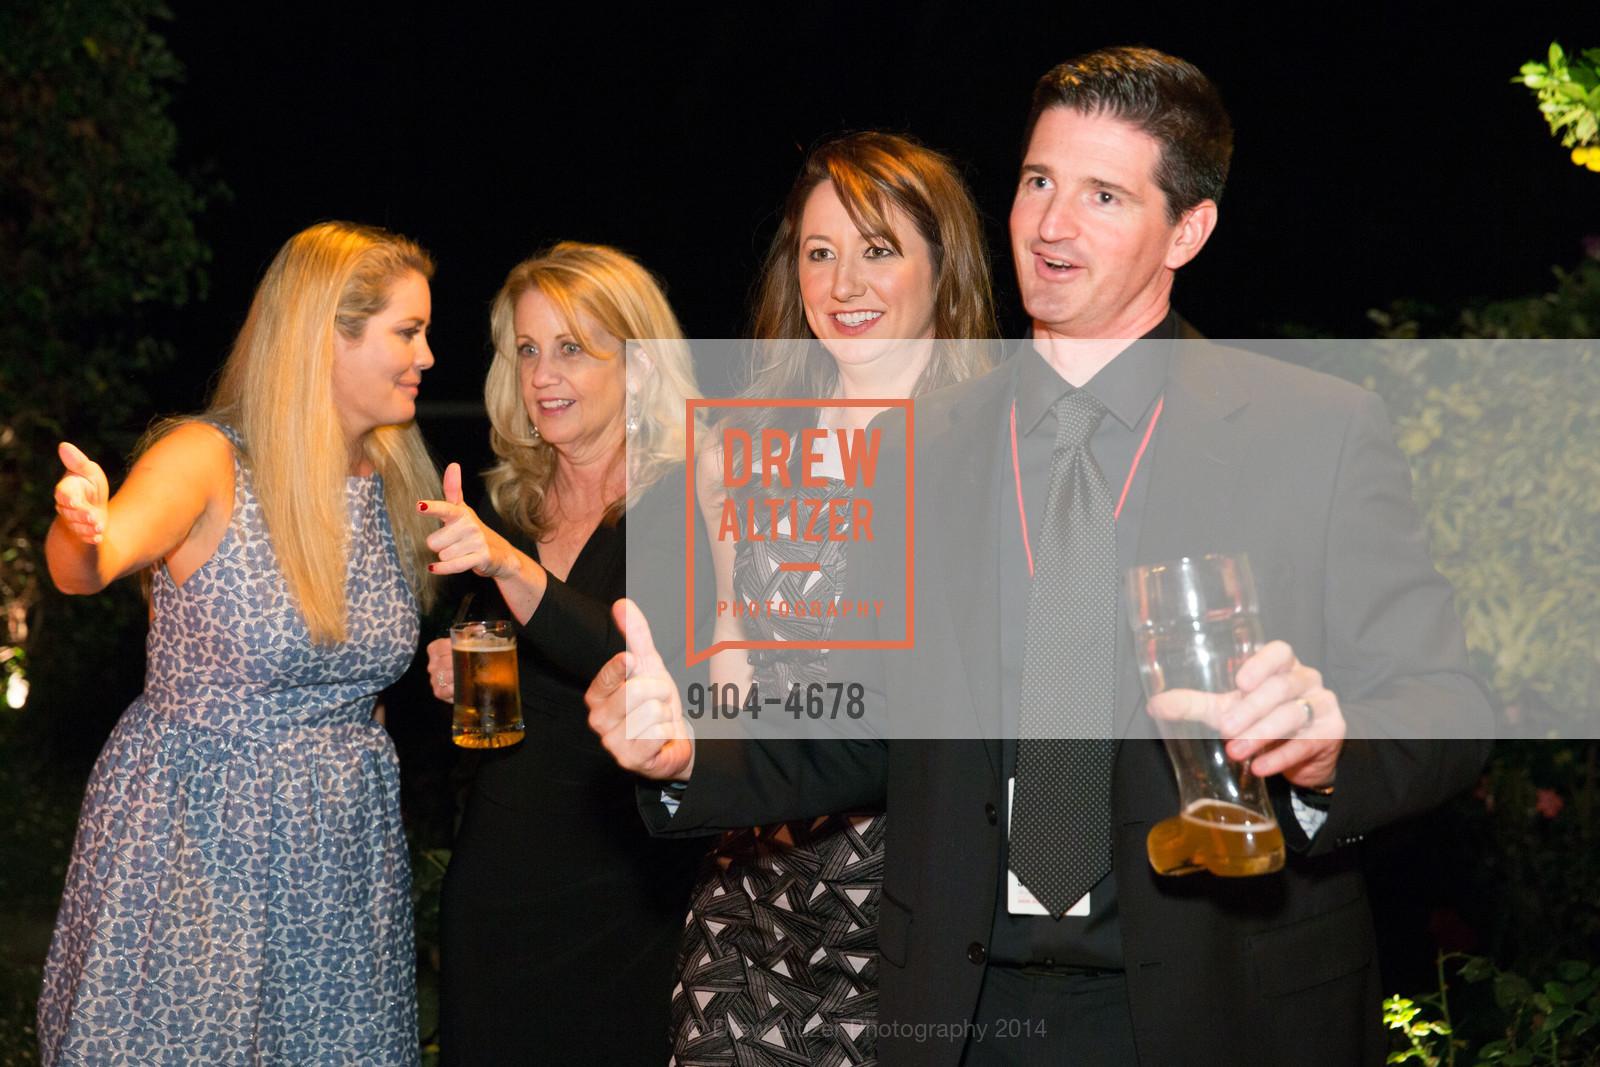 Kelly Grimes, Julie Wood, Lydia Facteau, Photo #9104-4678